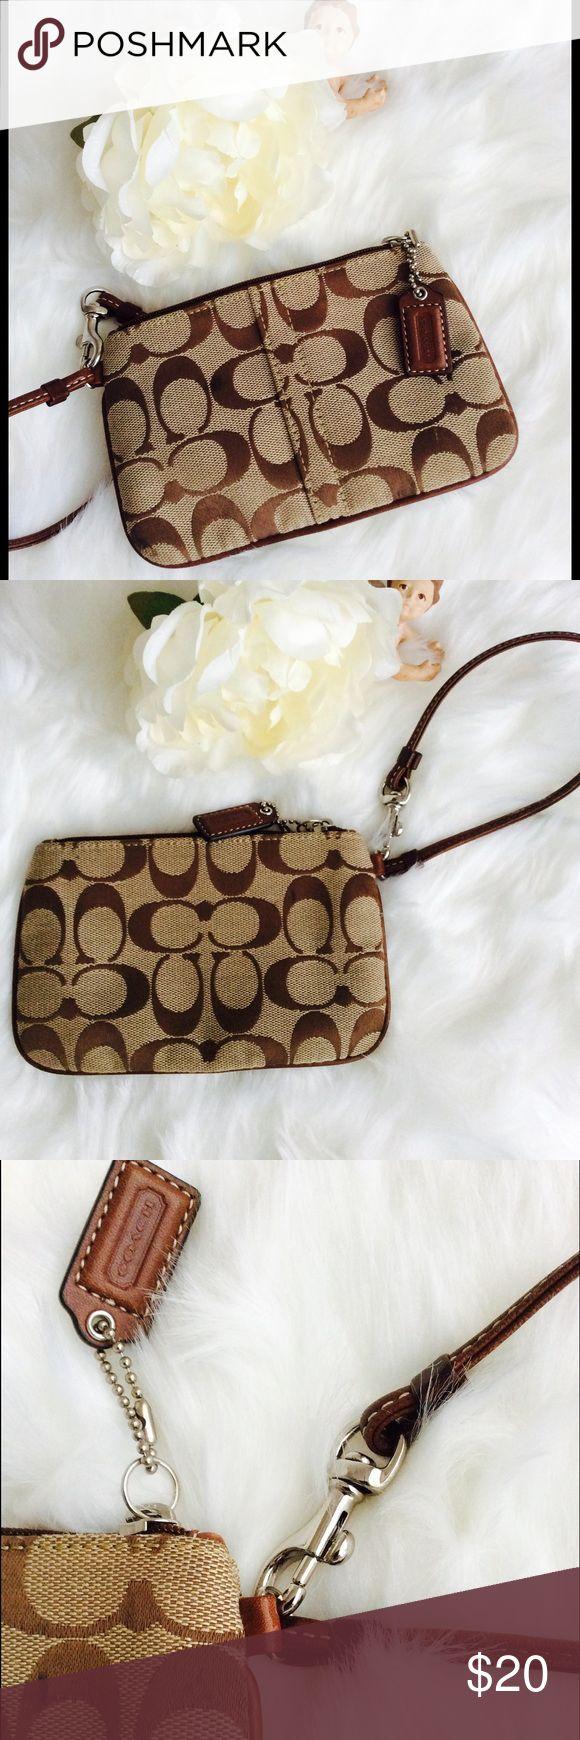 NWOT brand-new-COACH CLUTCH Brand-new-coach-clutch-purse, never been worn Coach Accessories Key & Card Holders